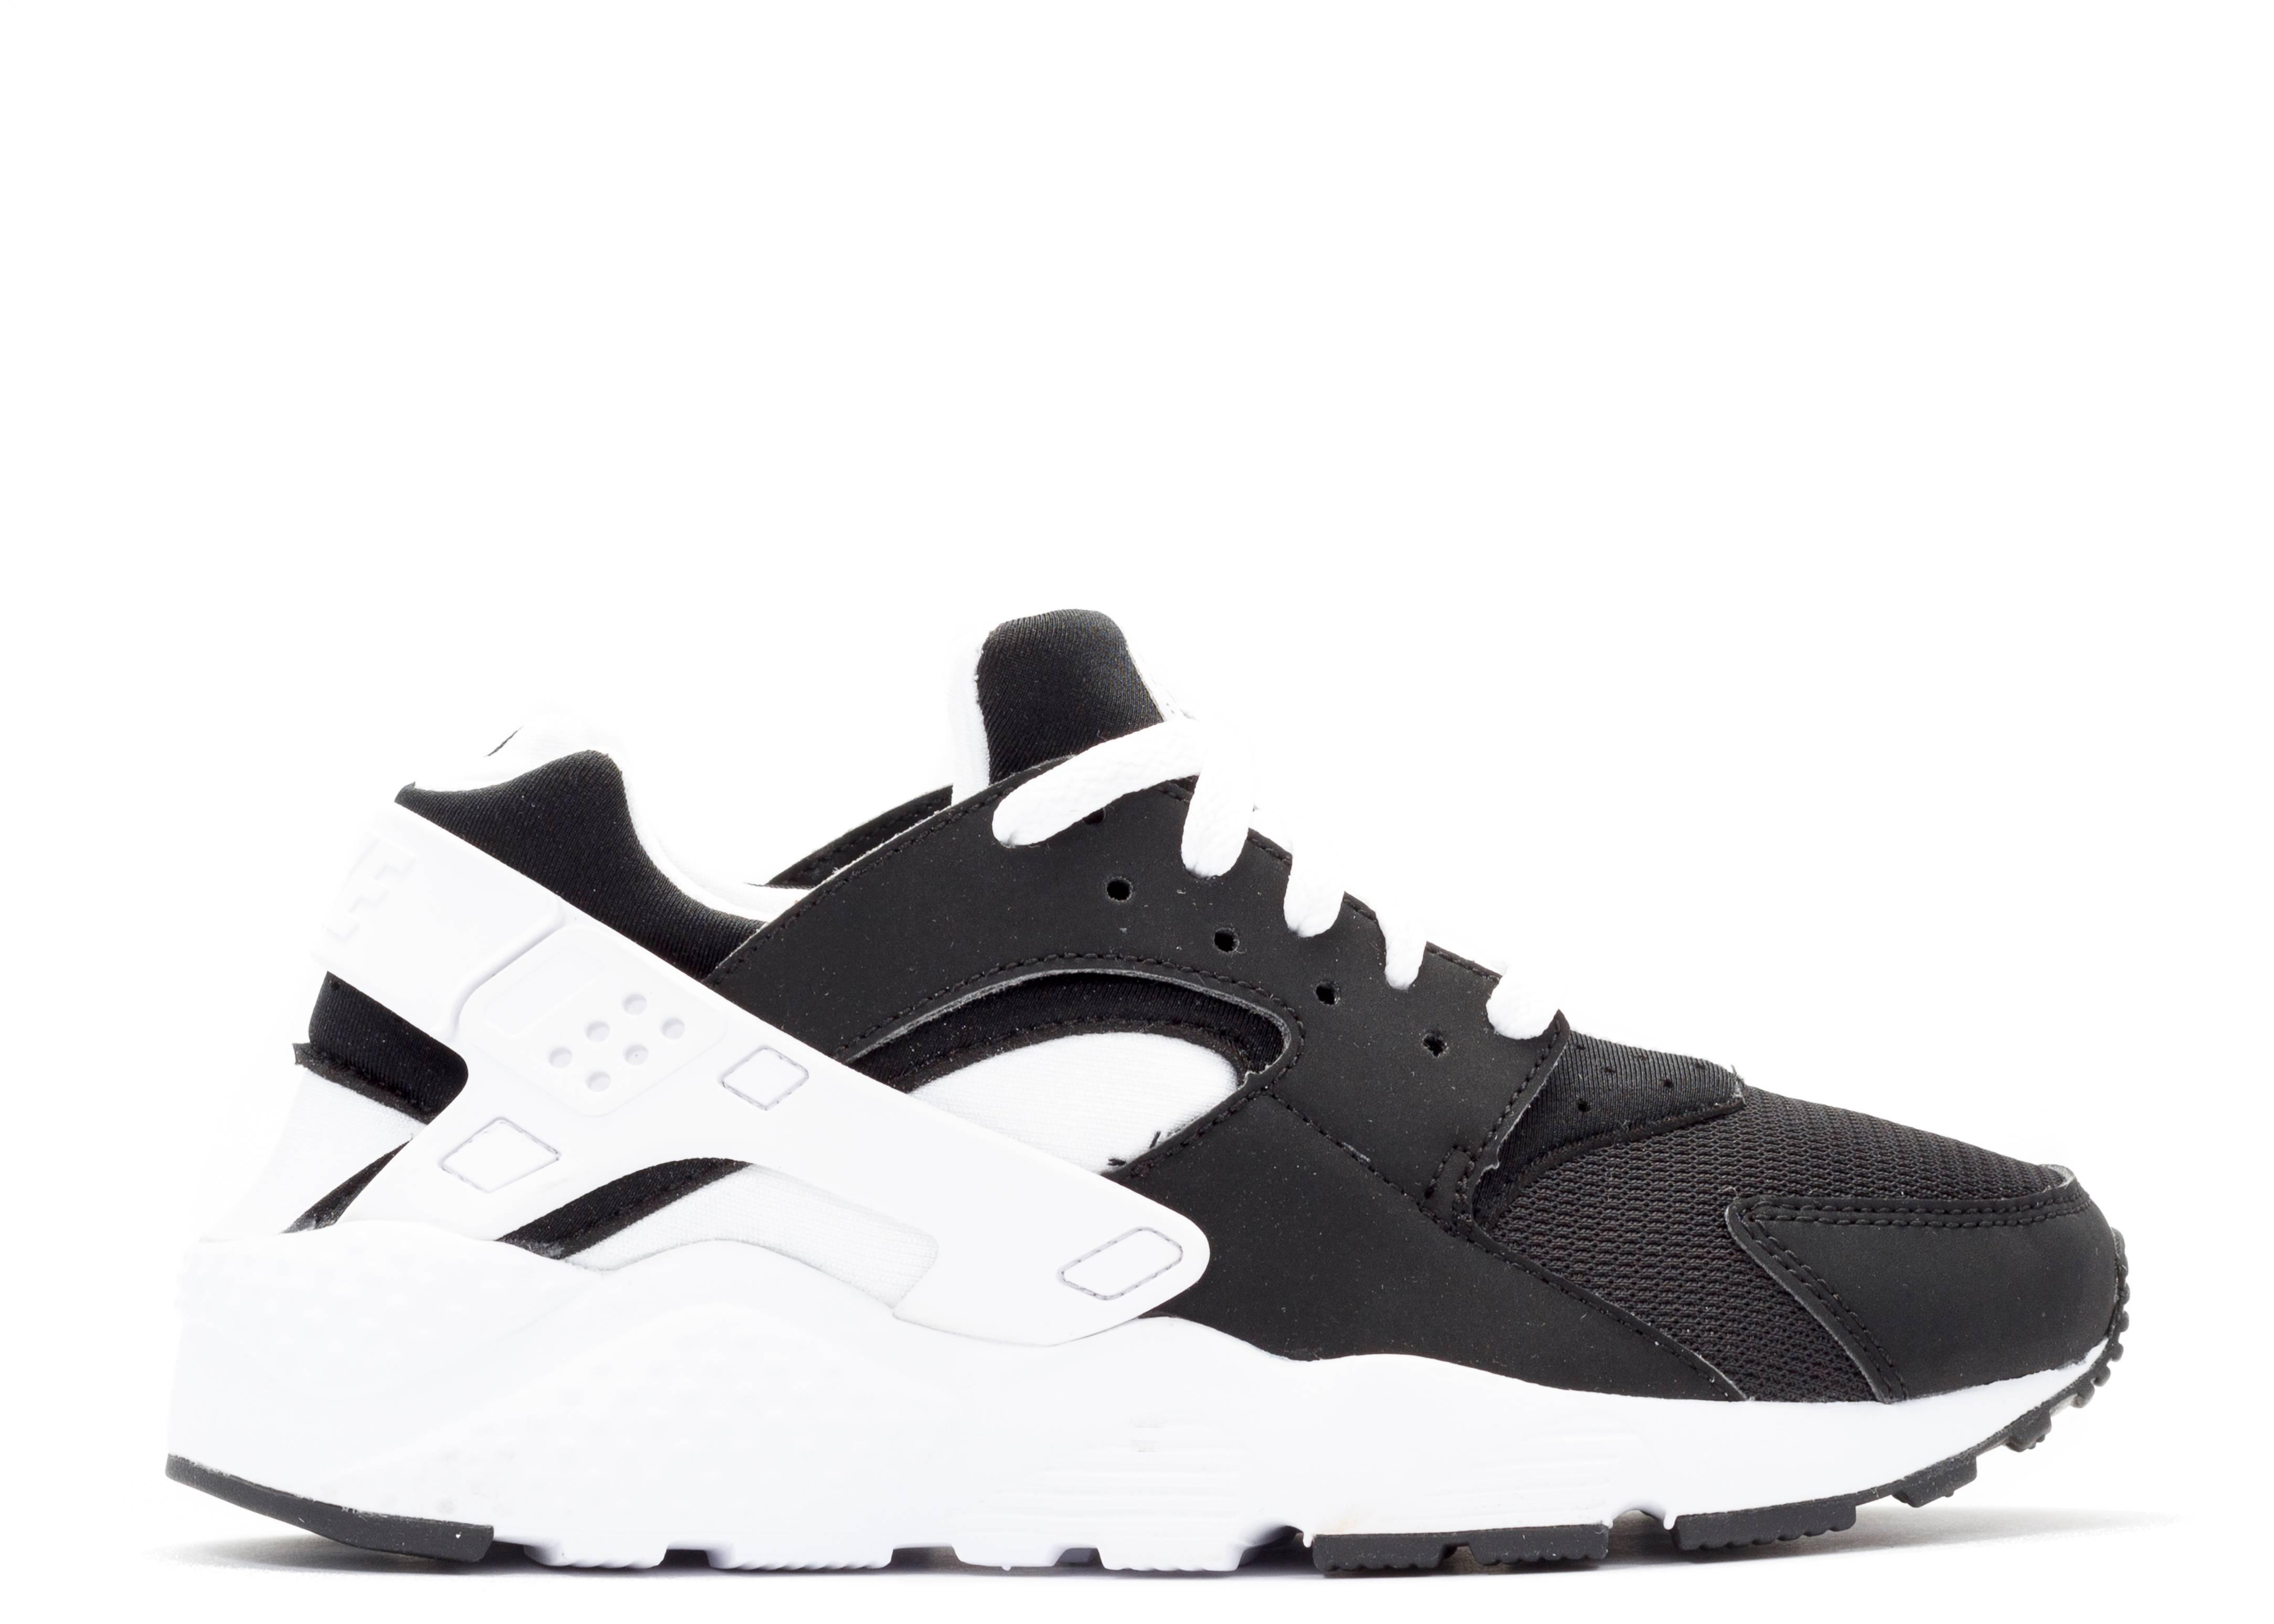 51650731e774d Huarache Run (gs) - Nike - 654275 009 - black white